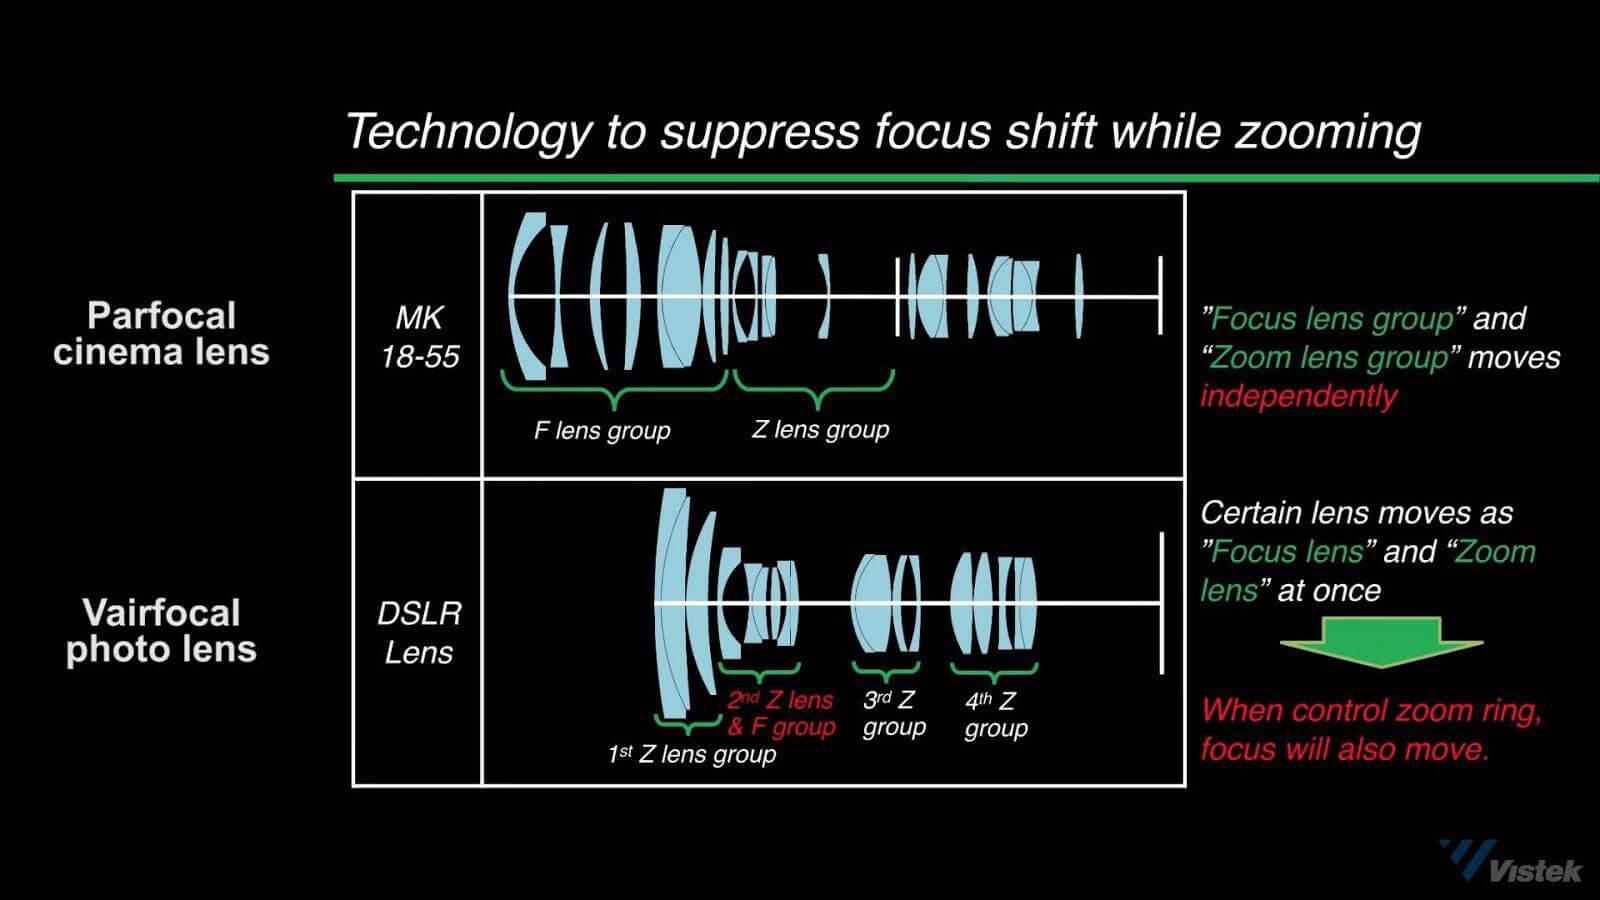 Parfocal camera lens vs Varifocal lenses